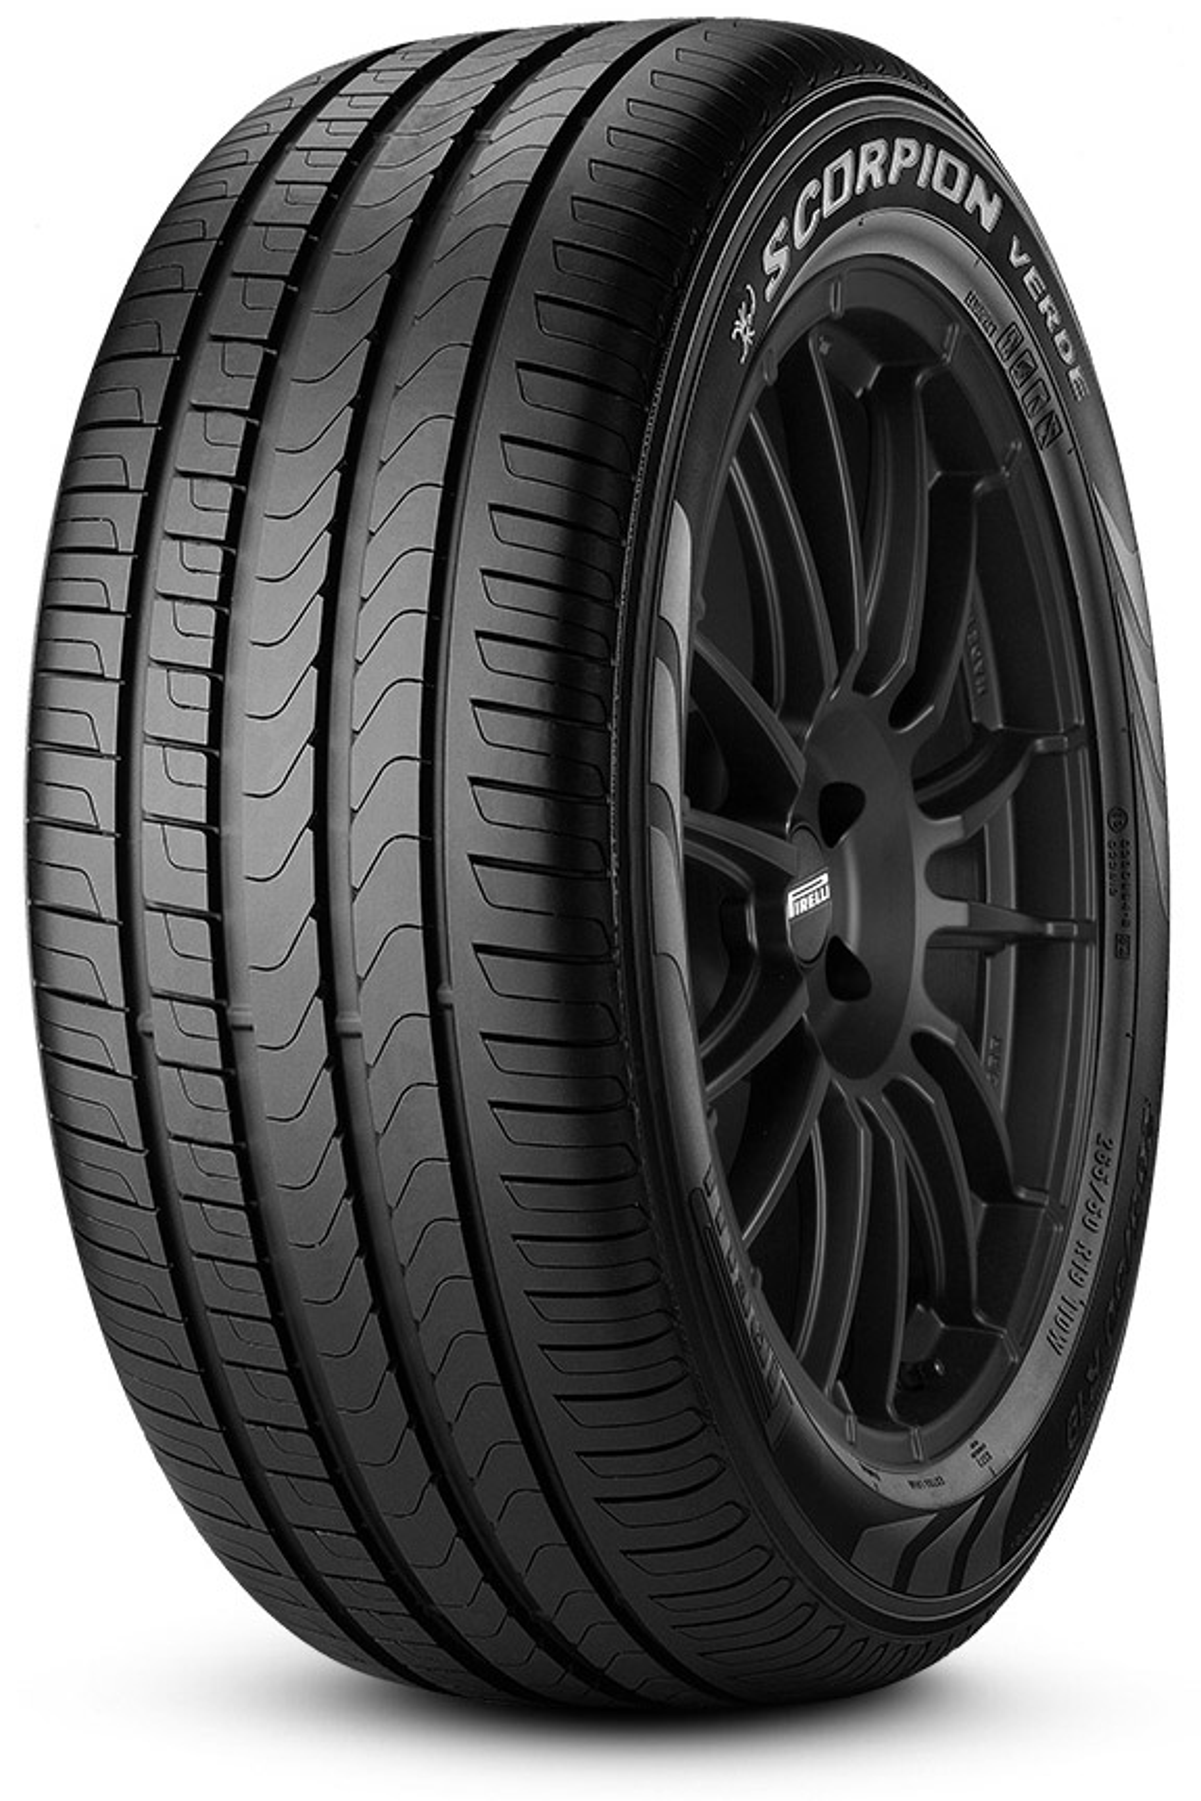 Pirelli 235/55R19 101V RFT Scorpion Verde ECO Mercedes (MOE) (2016) Fiyatları